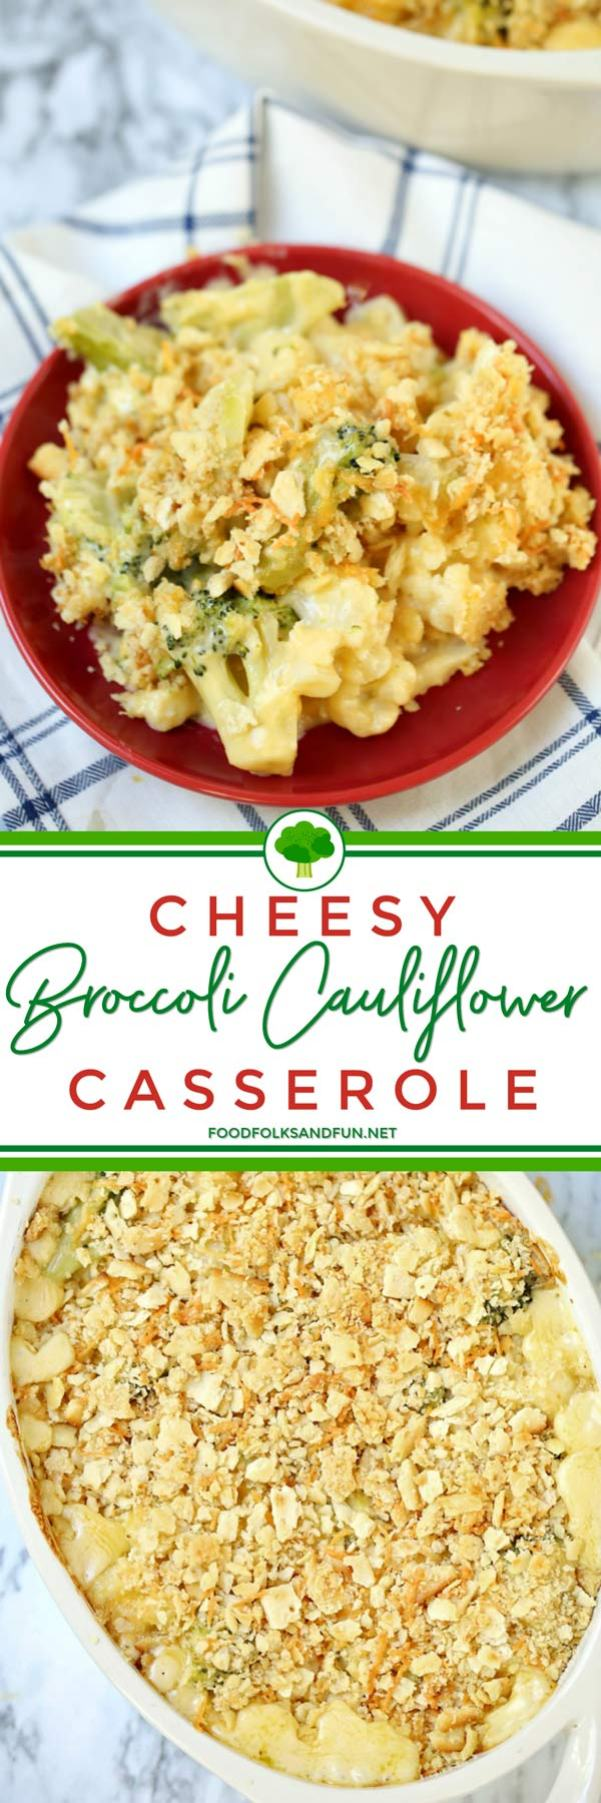 Best-Ever Cheesy Broccoli Cauliflower Casserole recipe!